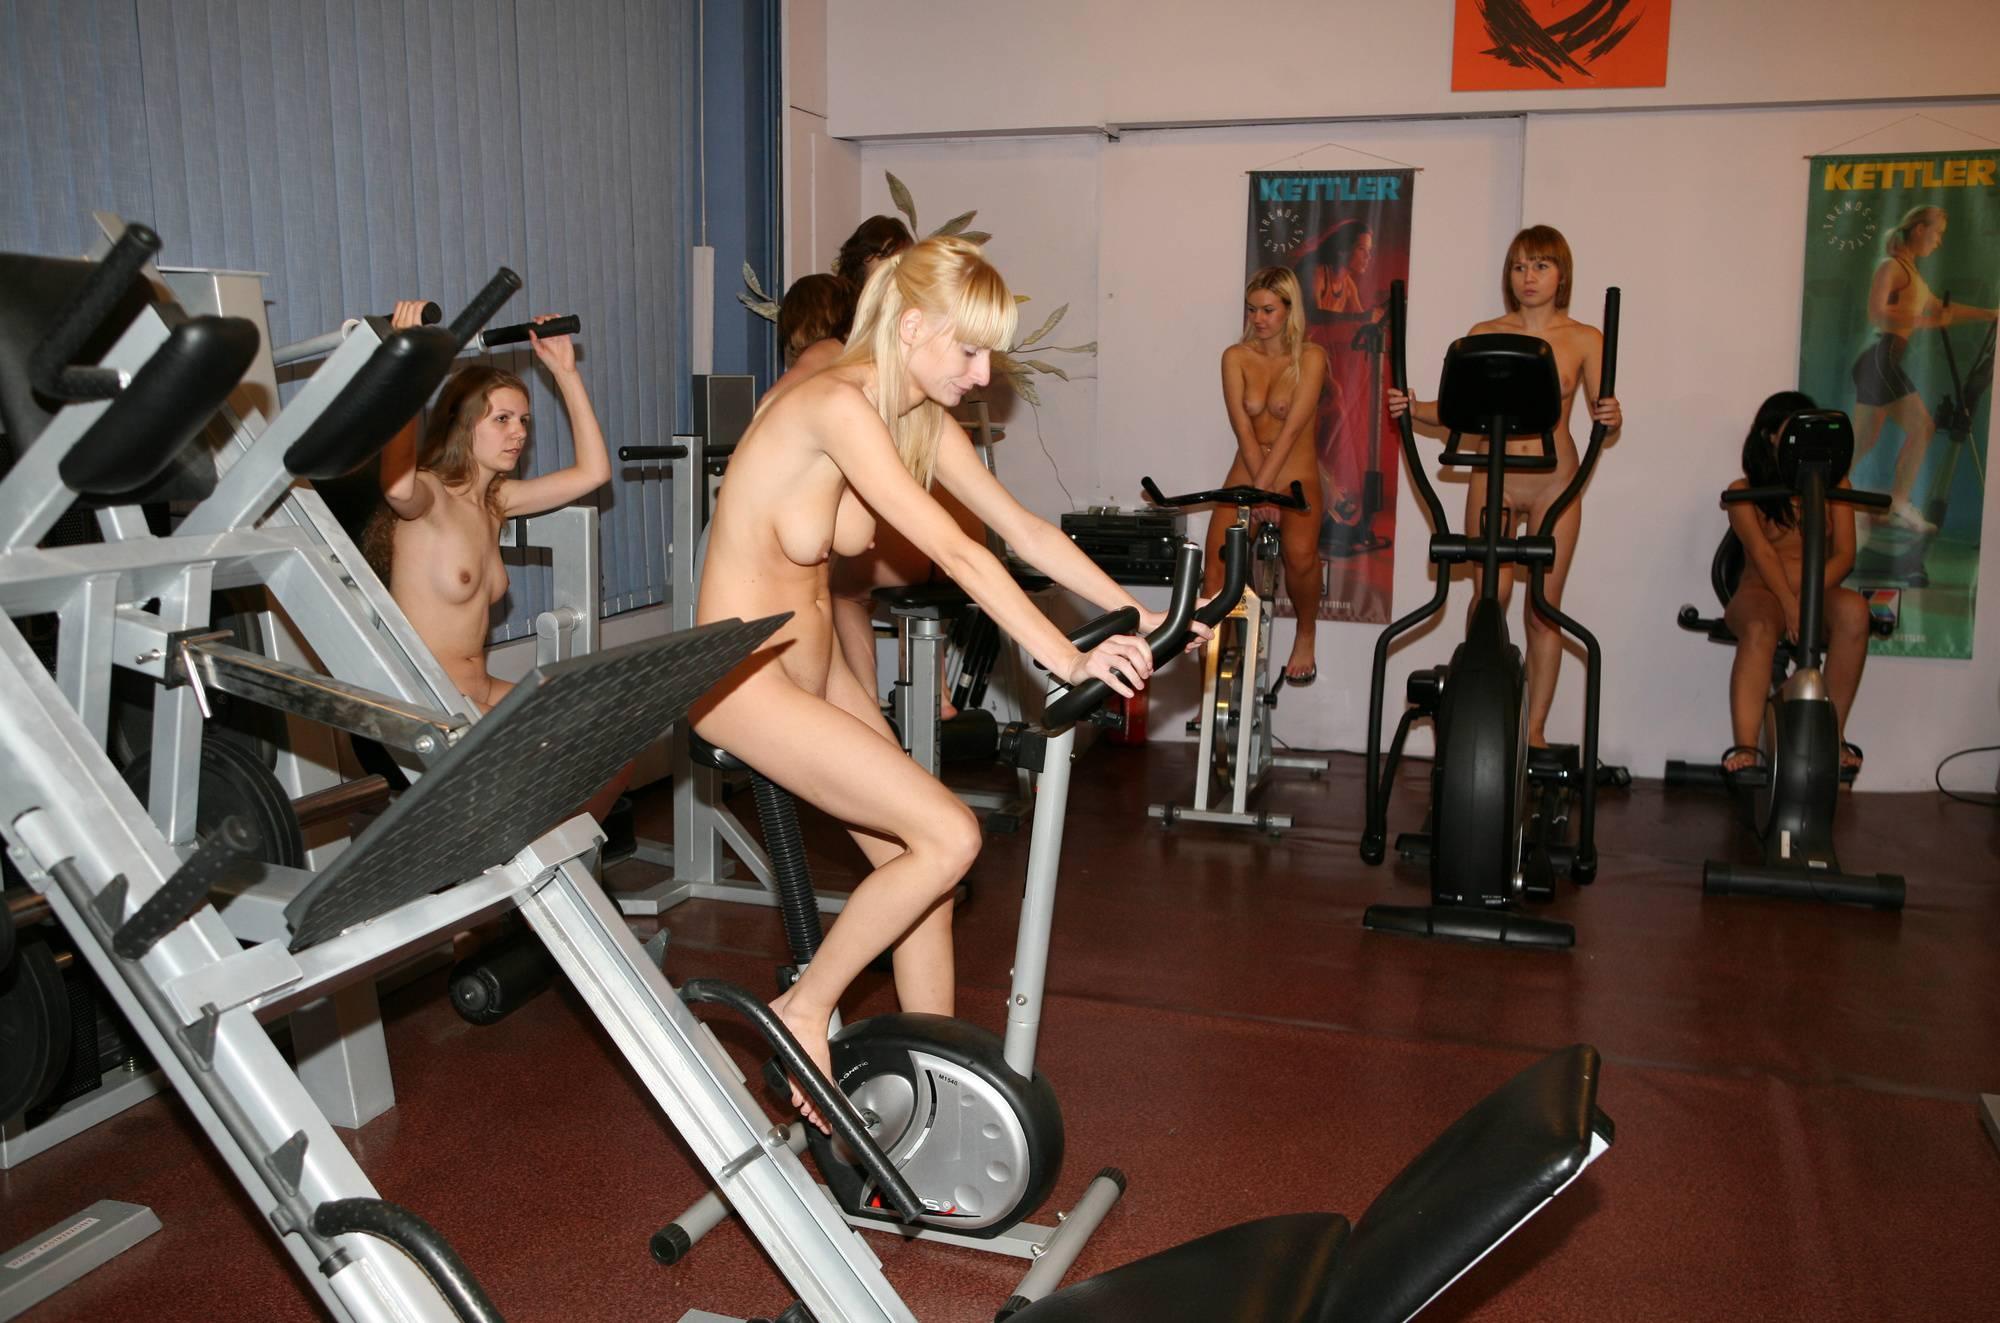 Gymnasts Riding The Bike - 3